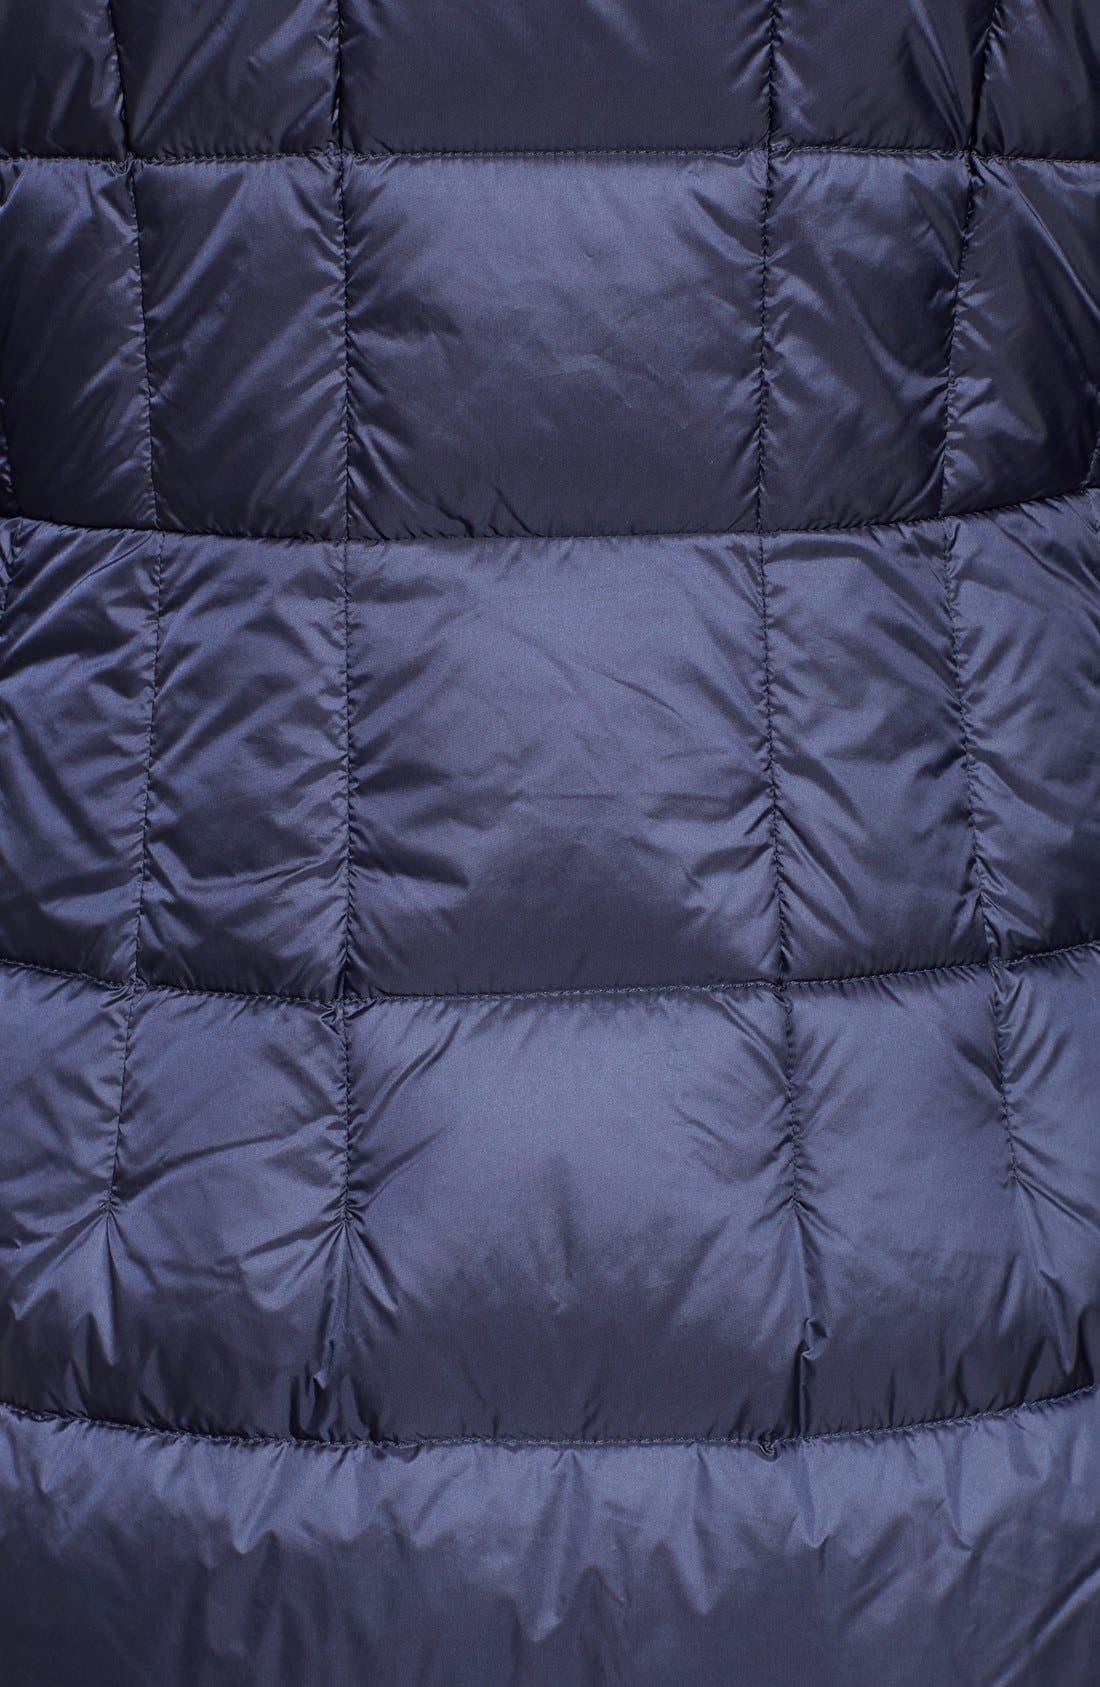 Packable Down Coat,                             Alternate thumbnail 5, color,                             Dark Blue